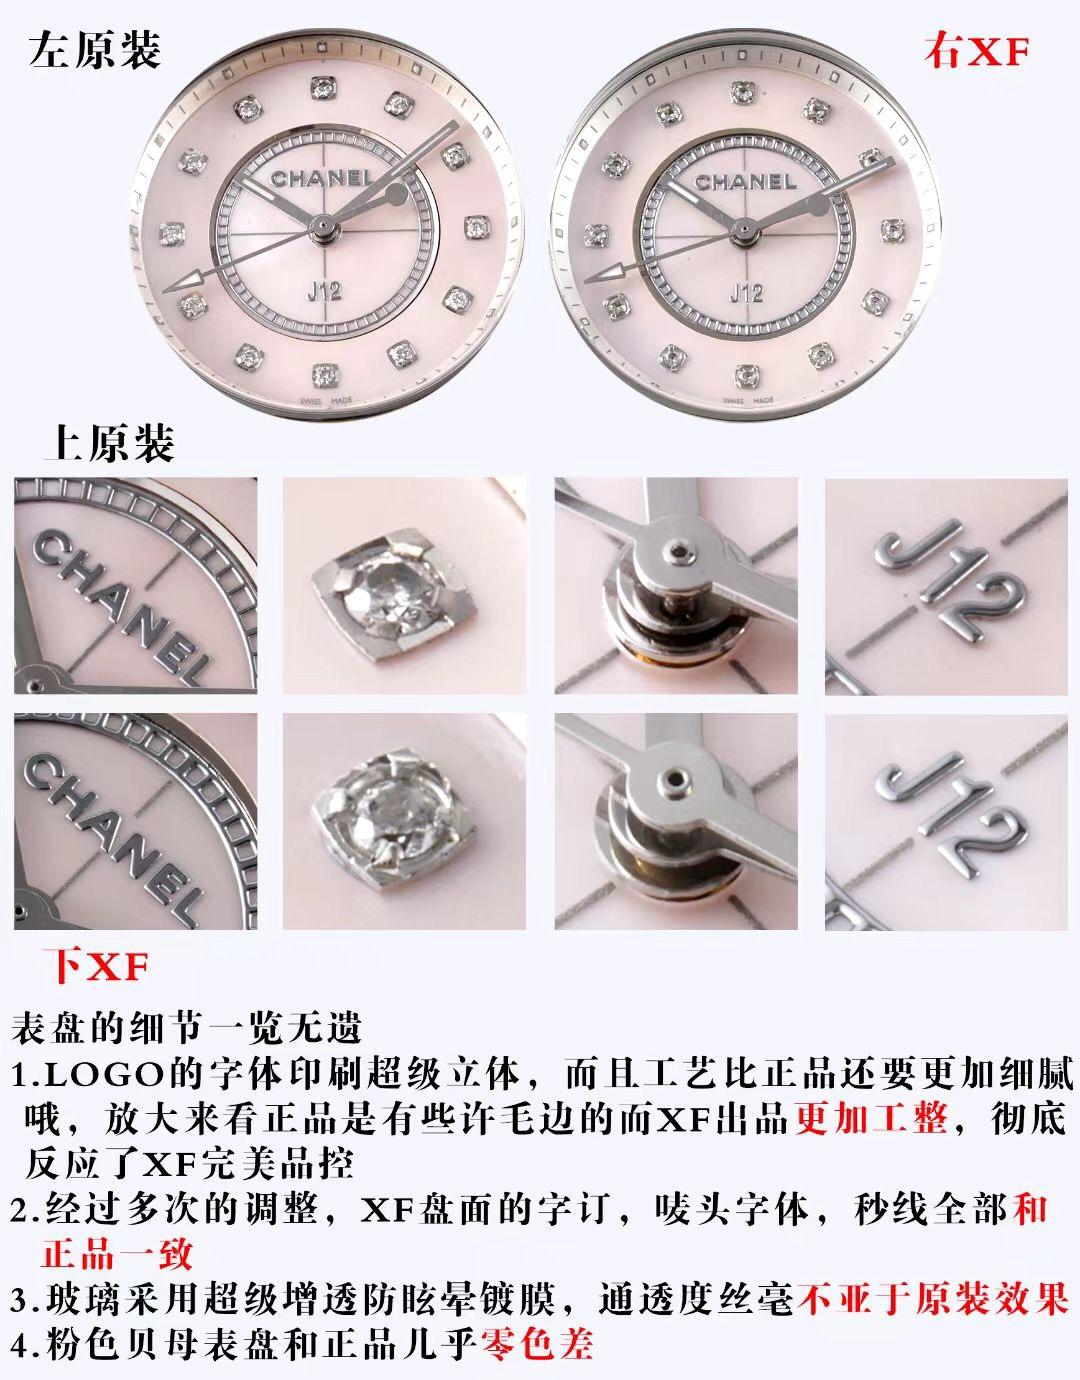 XF厂香奈儿J12粉色贝母盘白陶瓷石英款对比正品评测